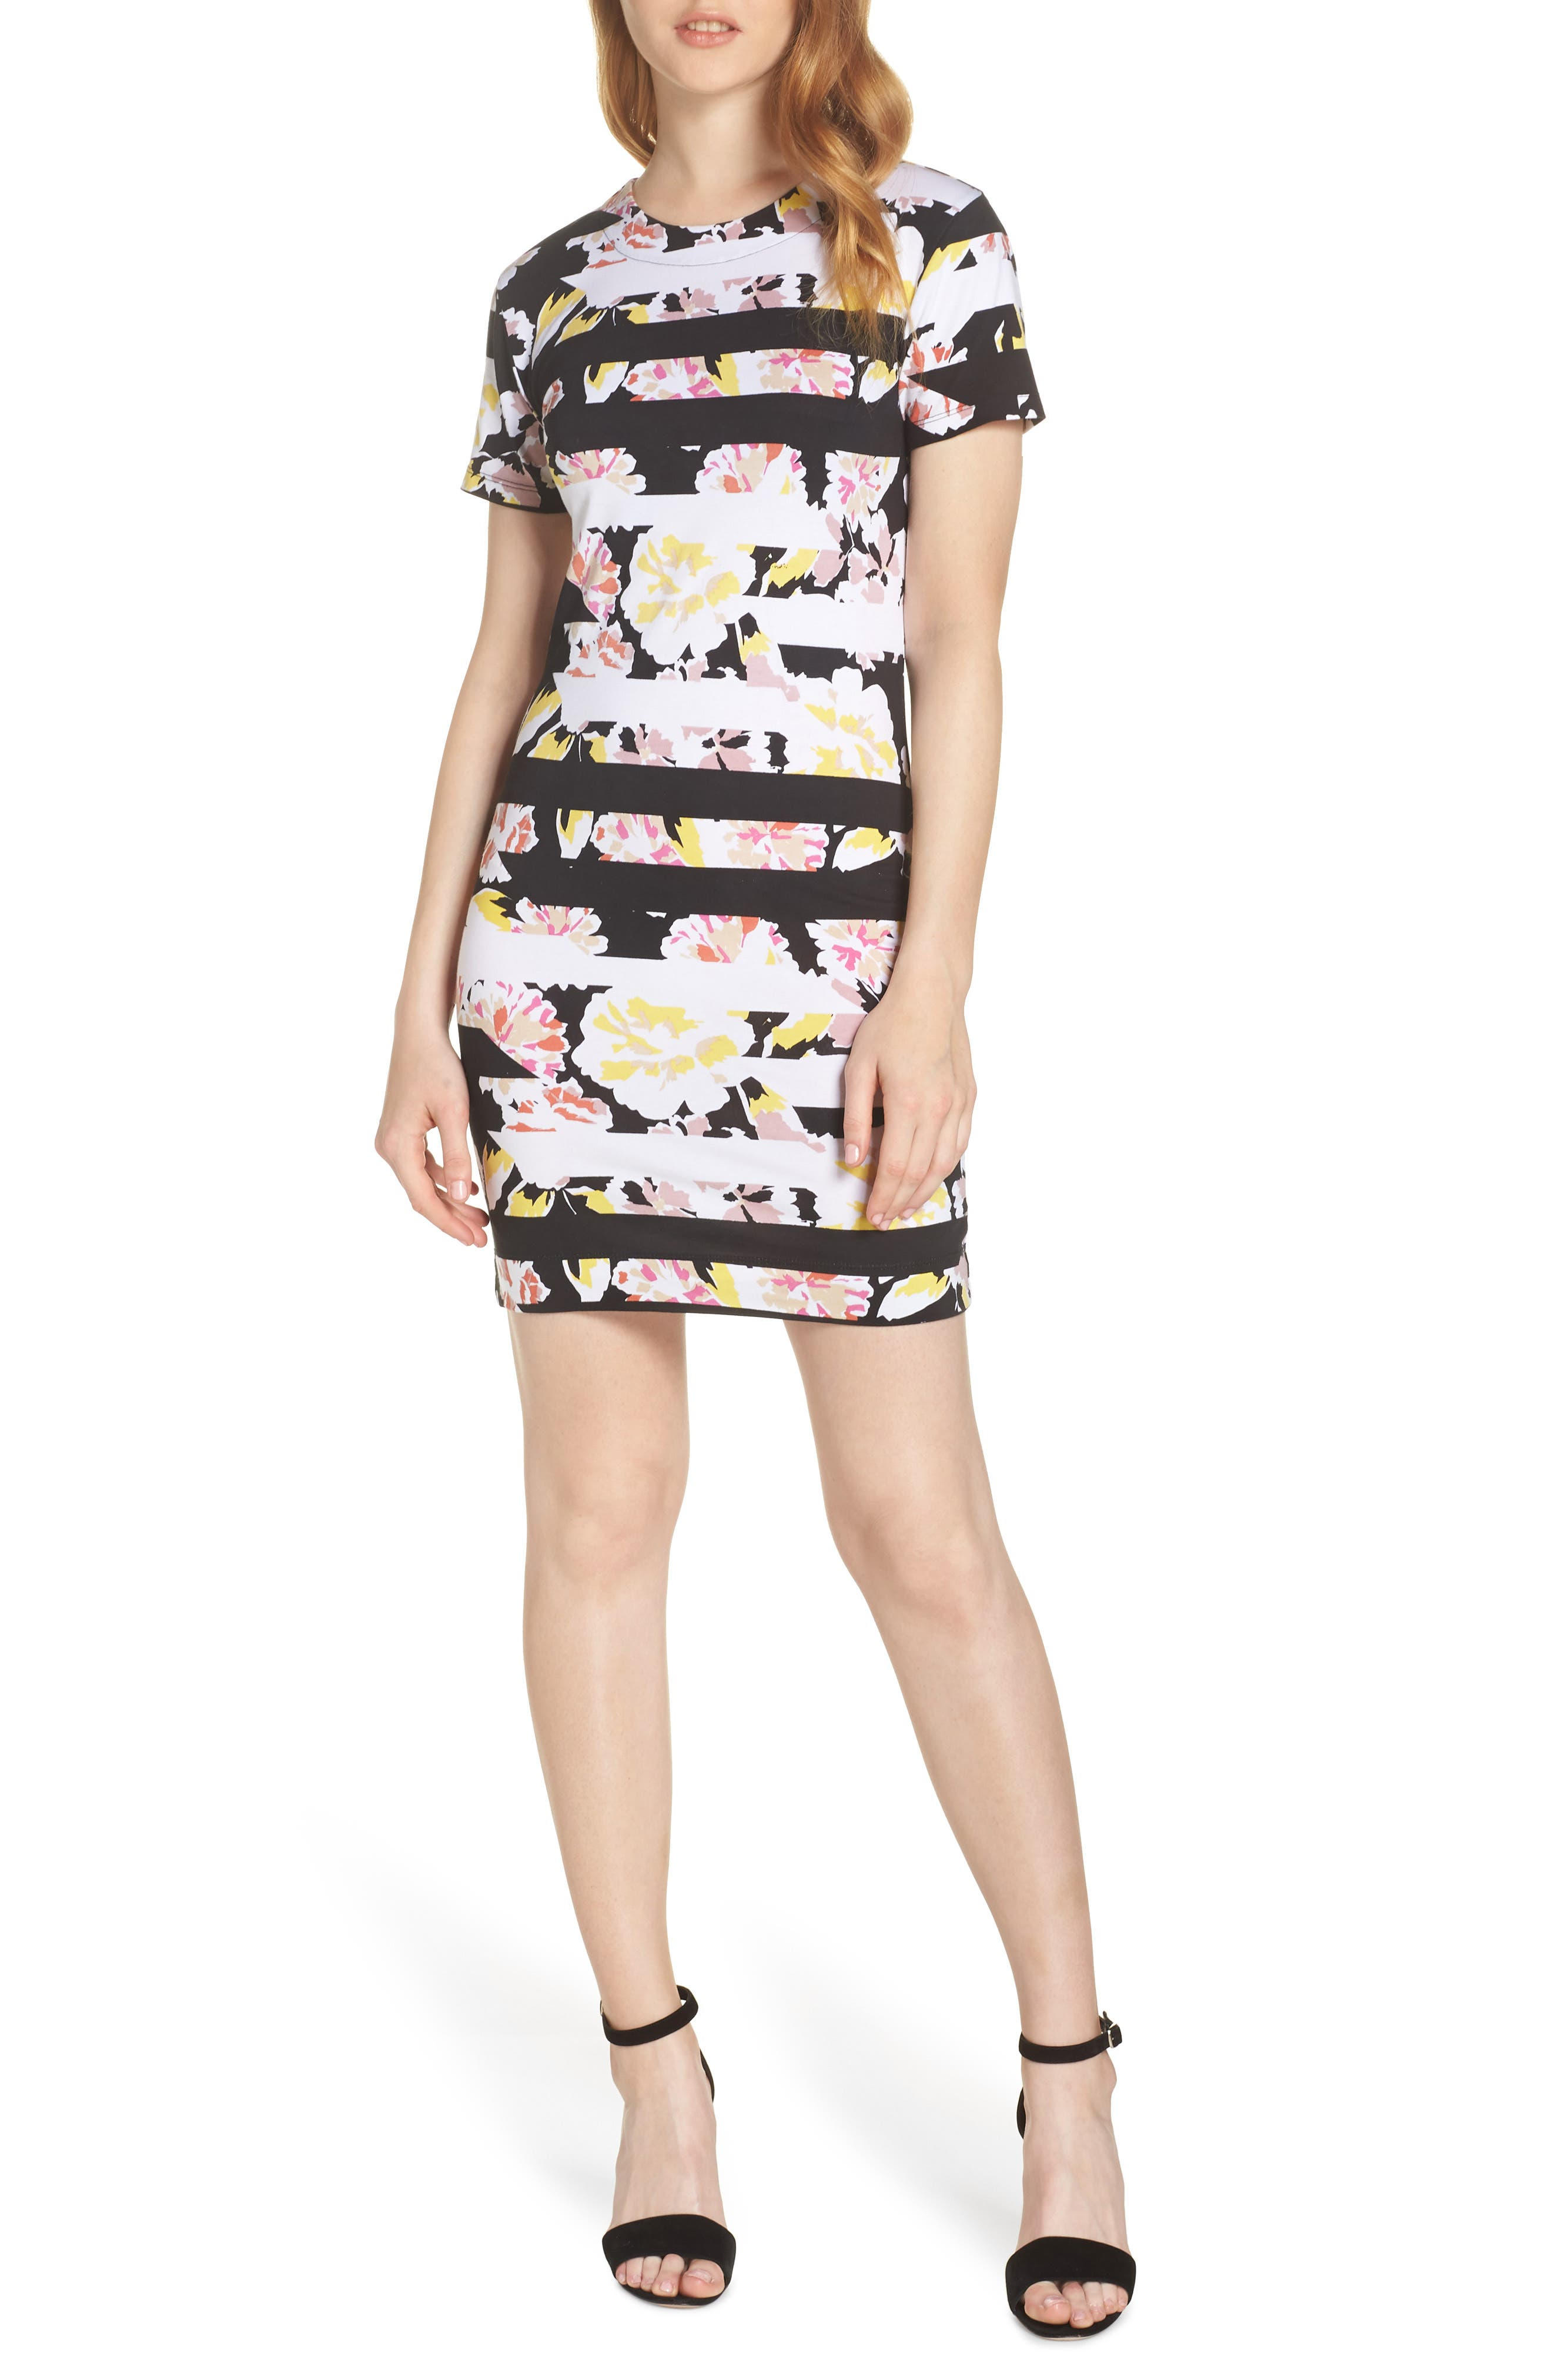 French Connection Enoshima Print Jersey Dress, Black